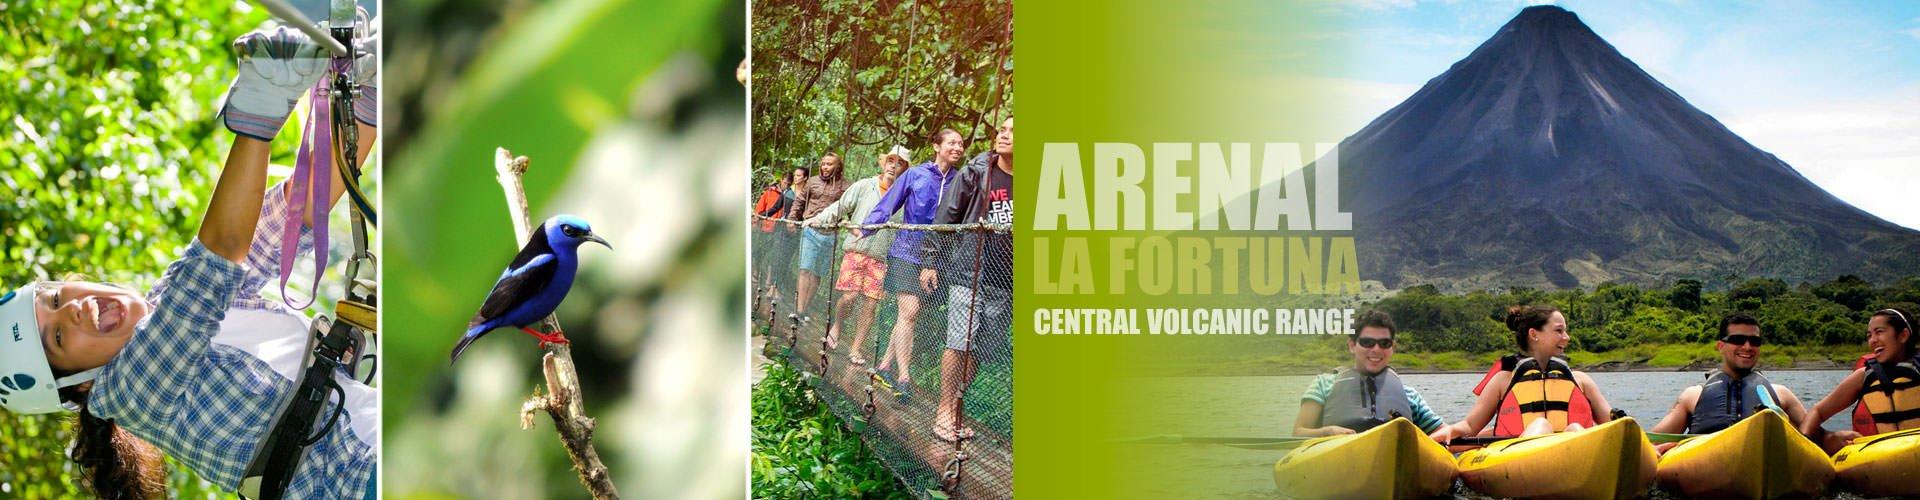 Arenal – La Fortuna